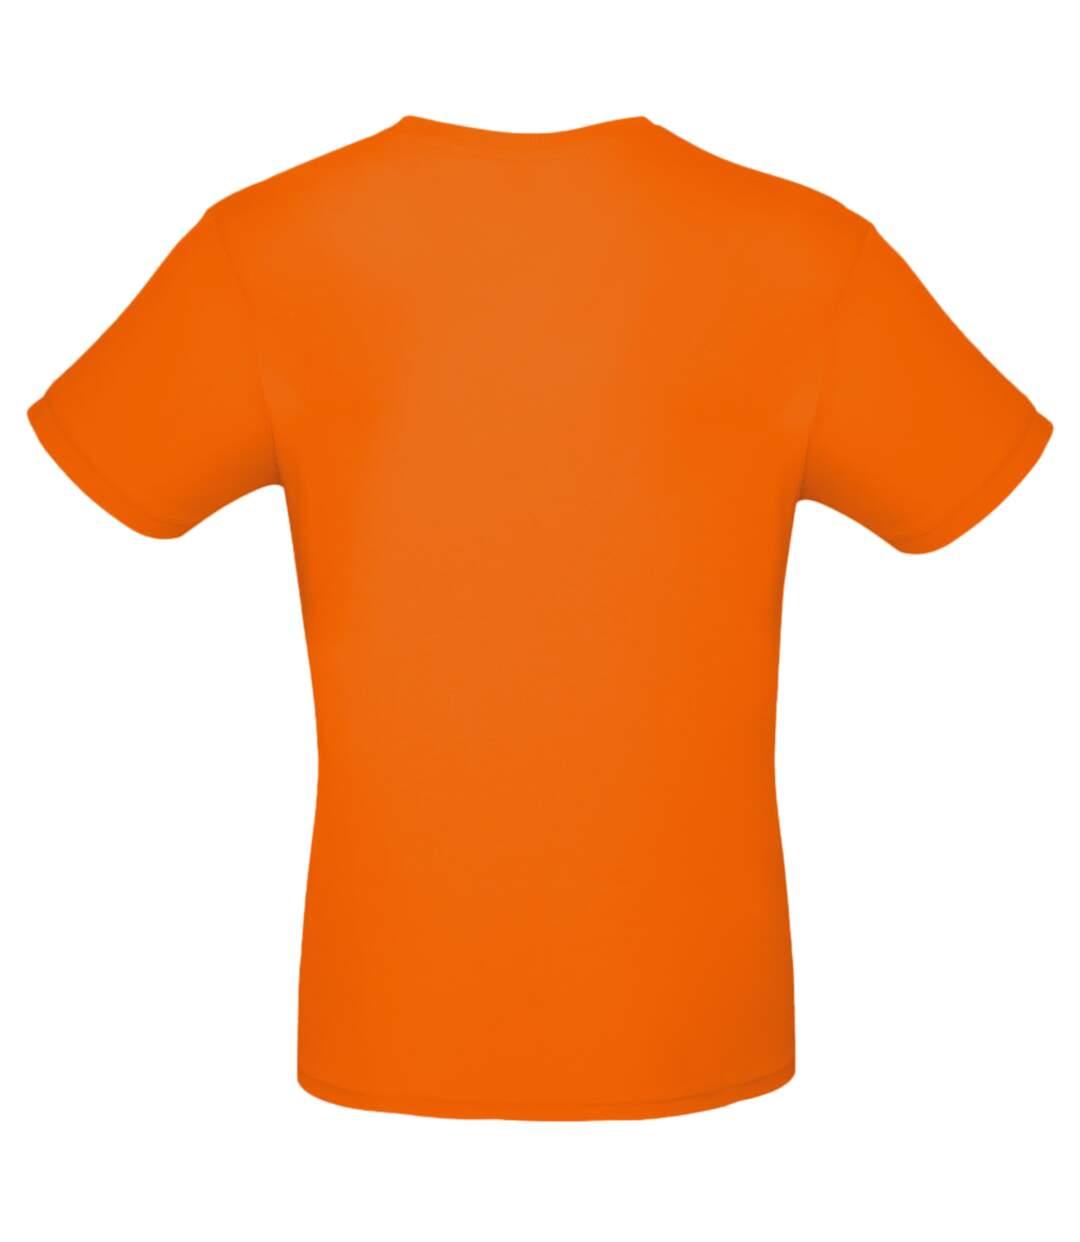 B&C Mens #E150 Tee (Fire Red) - UTBC3910